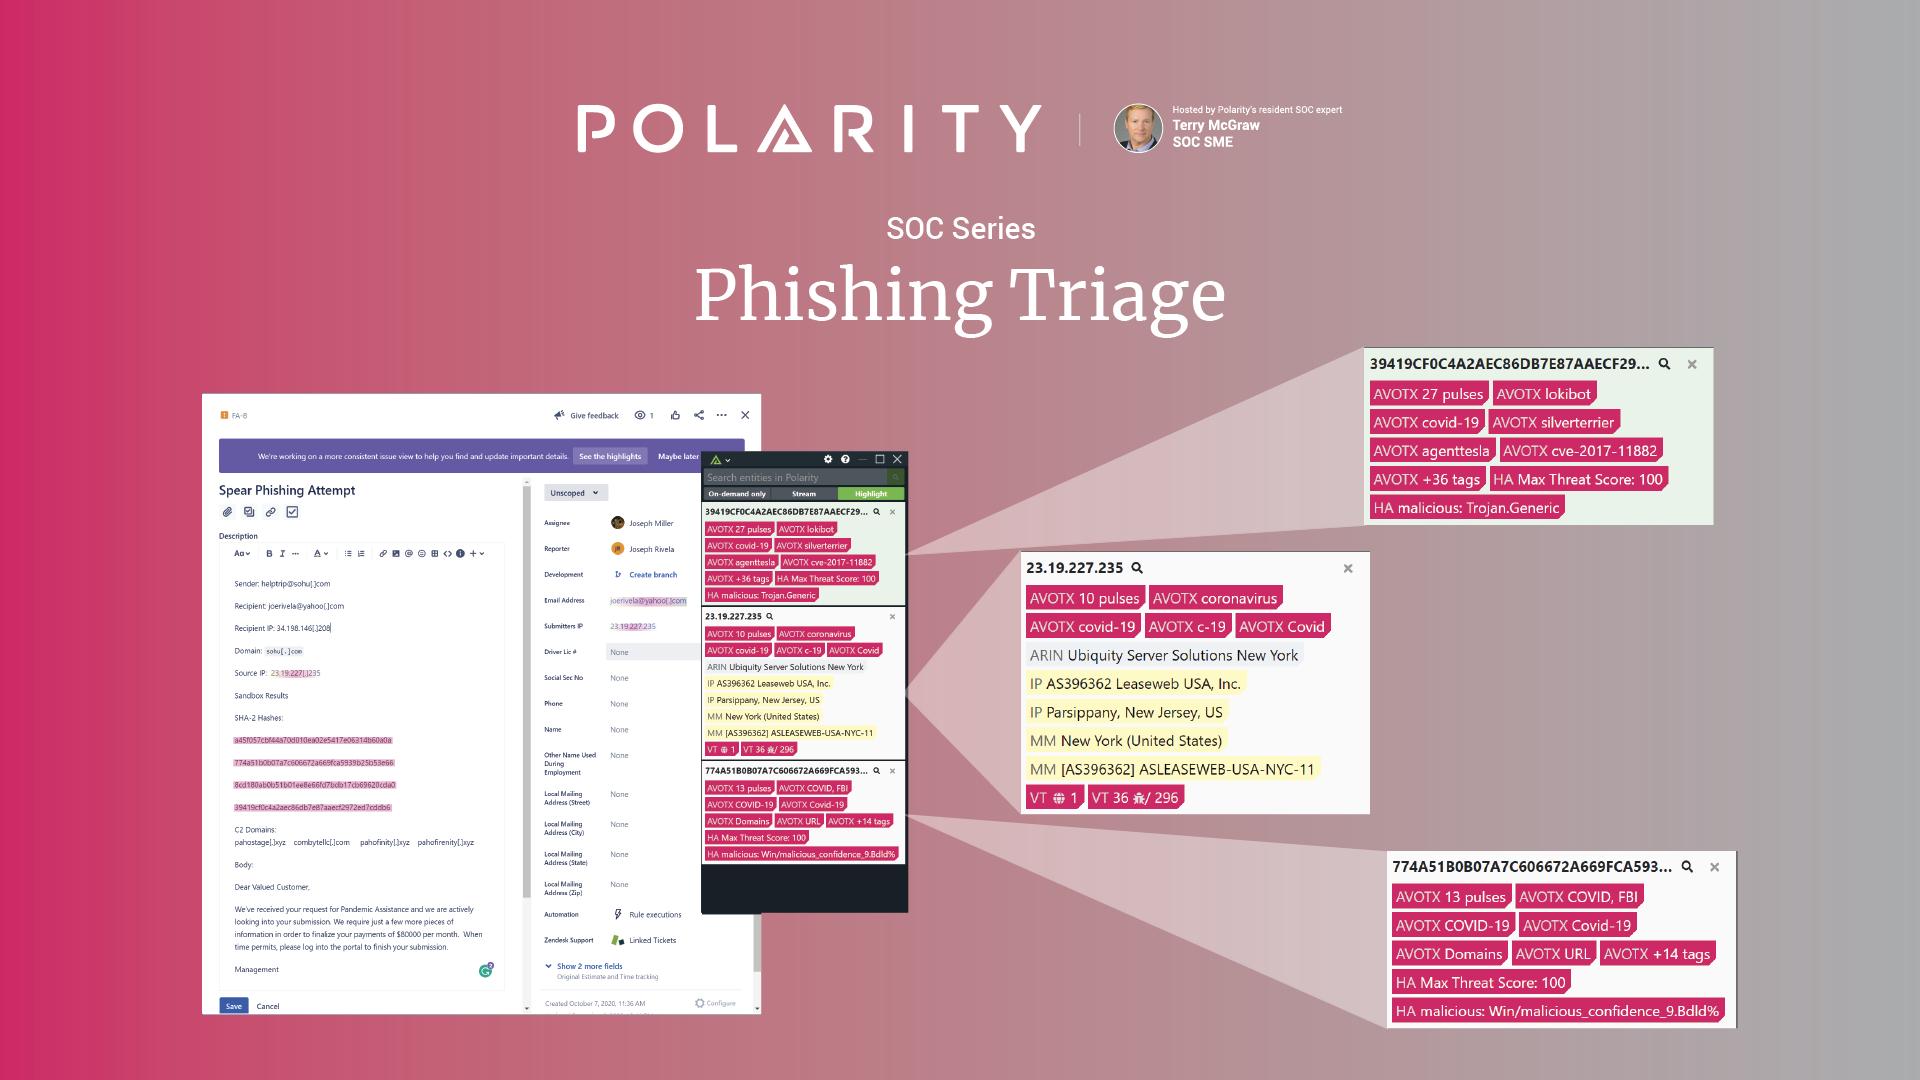 SOC Series: Phishing Triage cover image